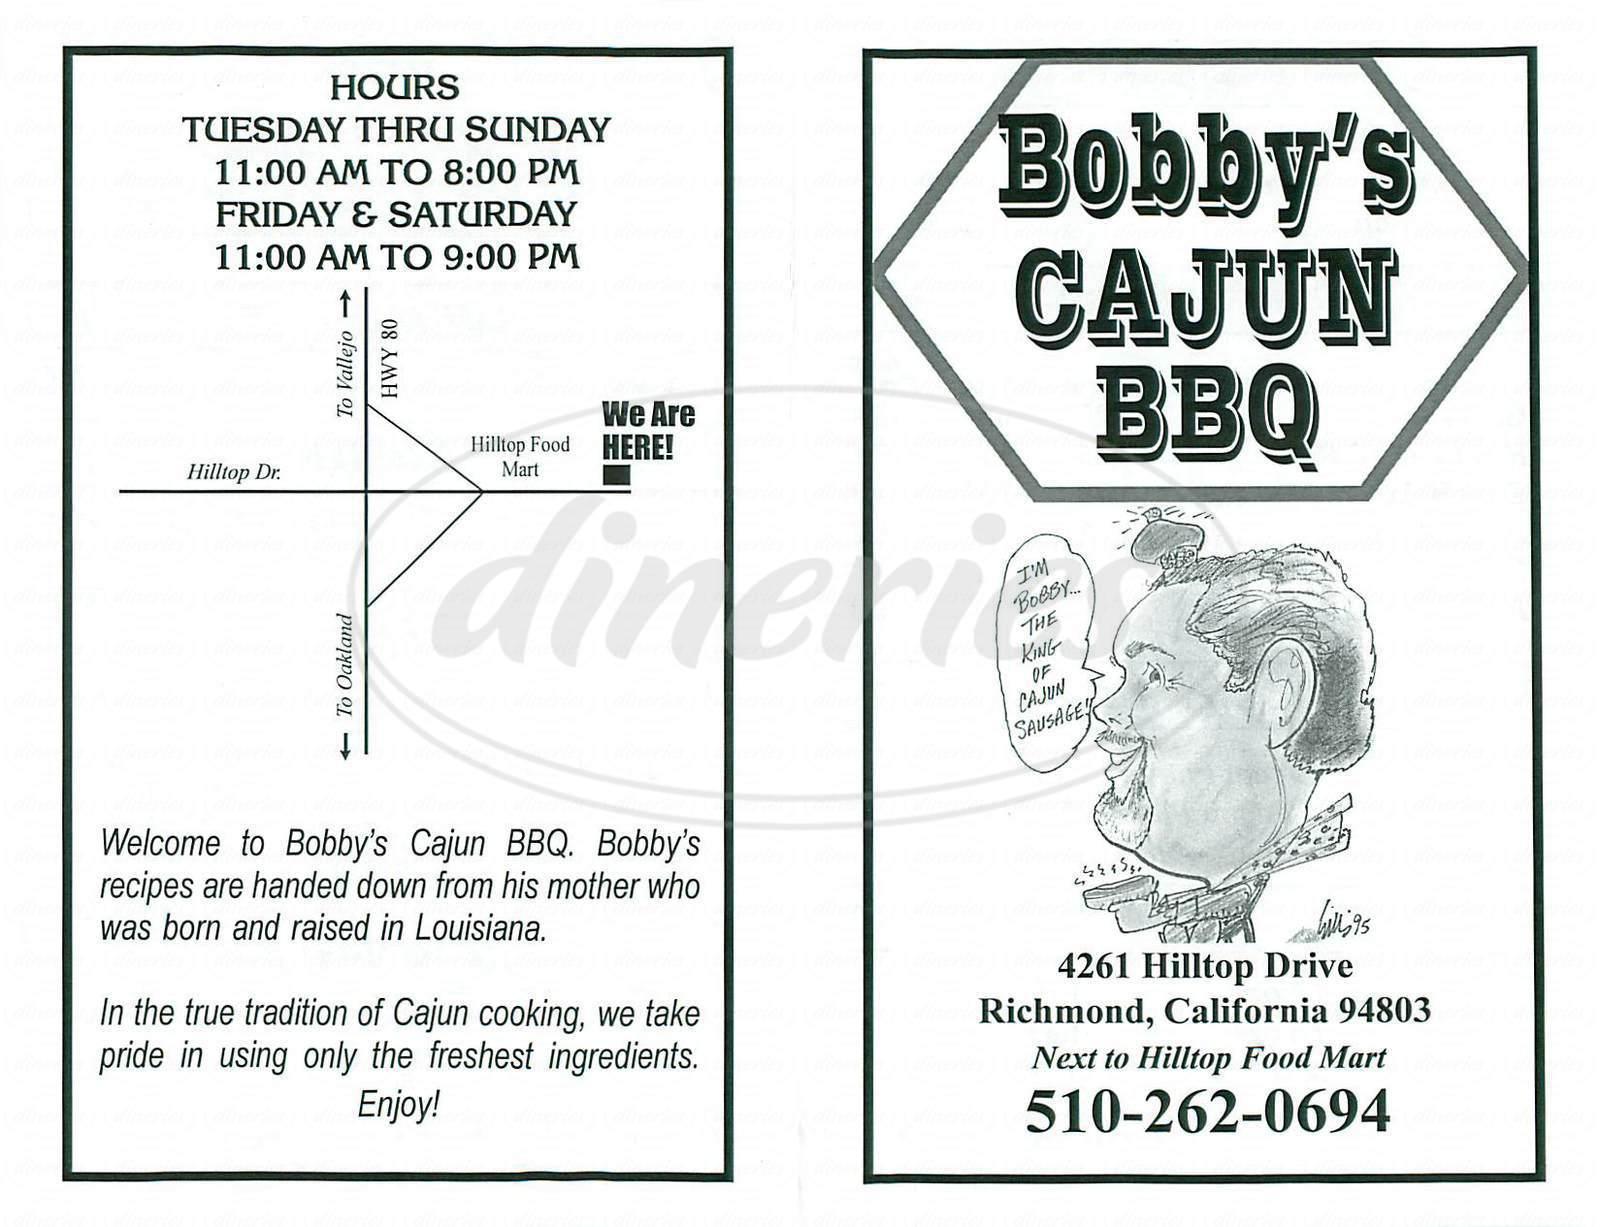 menu for Bobby's Cajun BBQ